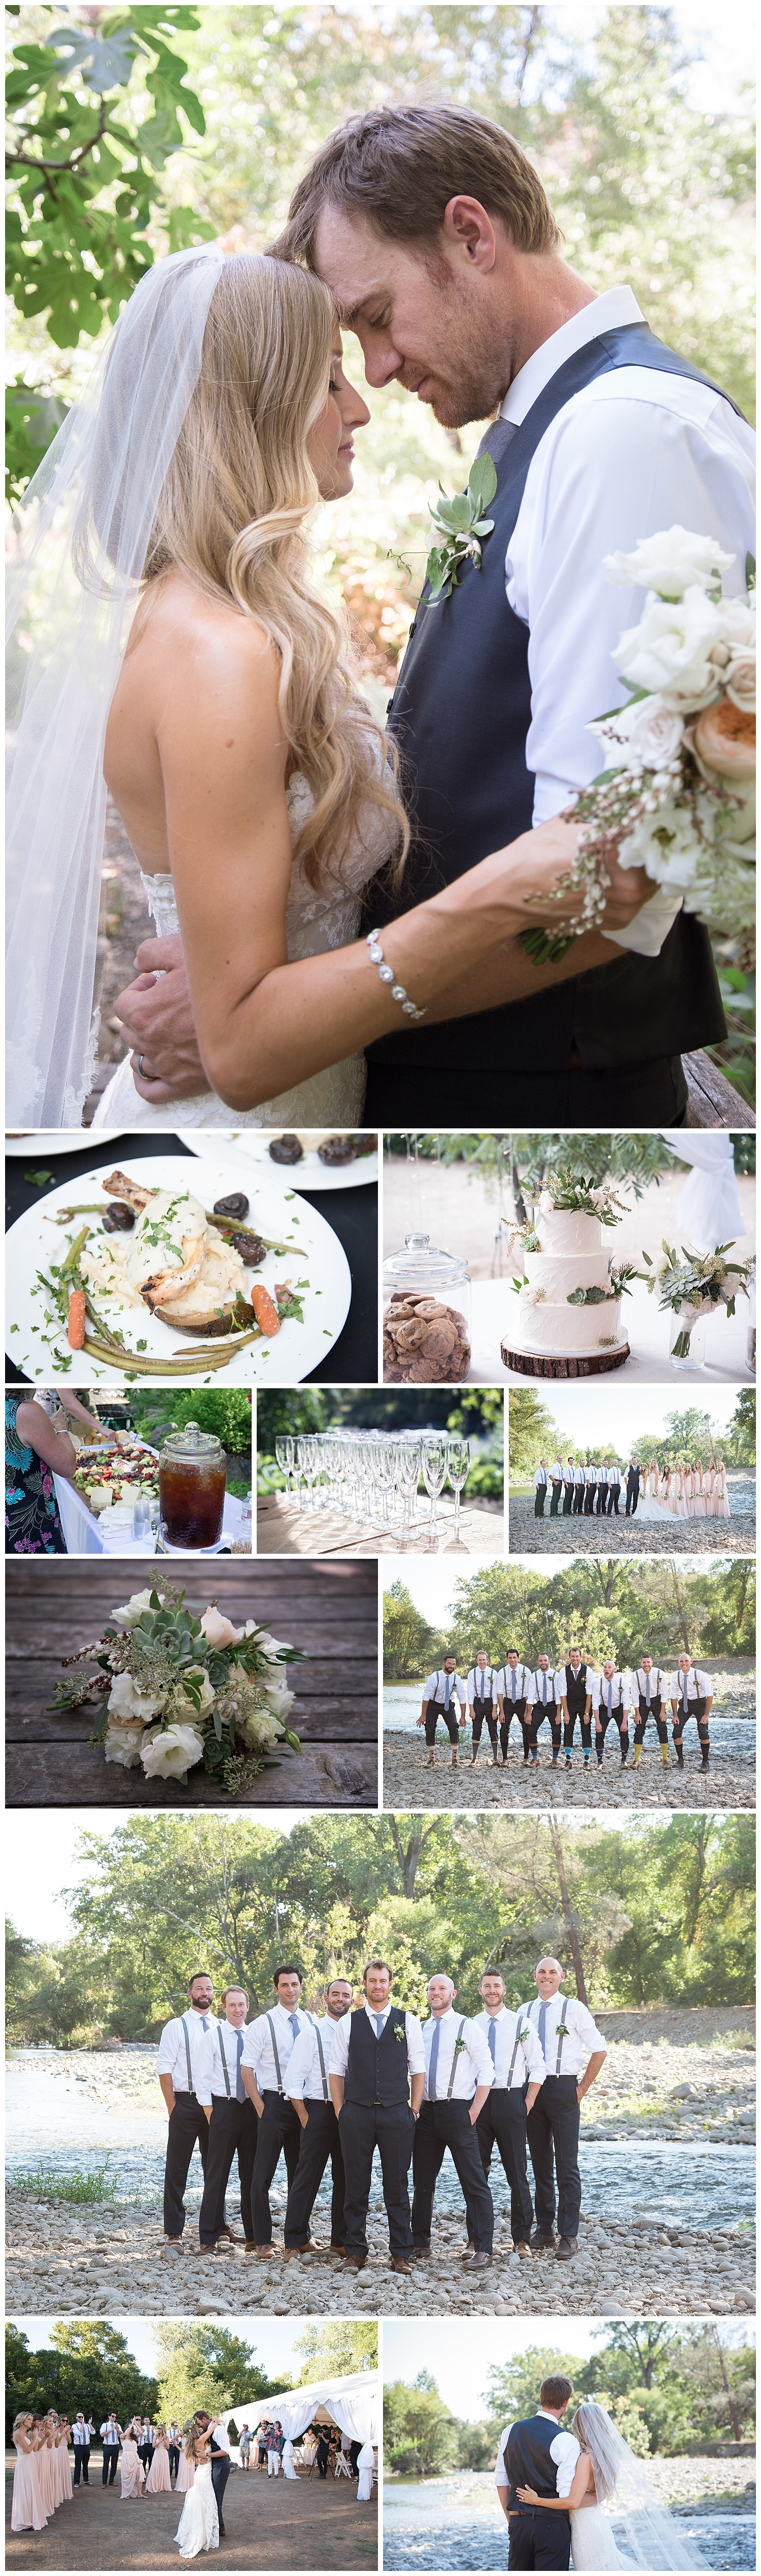 the-530-bride_butte-creek-canyon-wedding-chico-ca